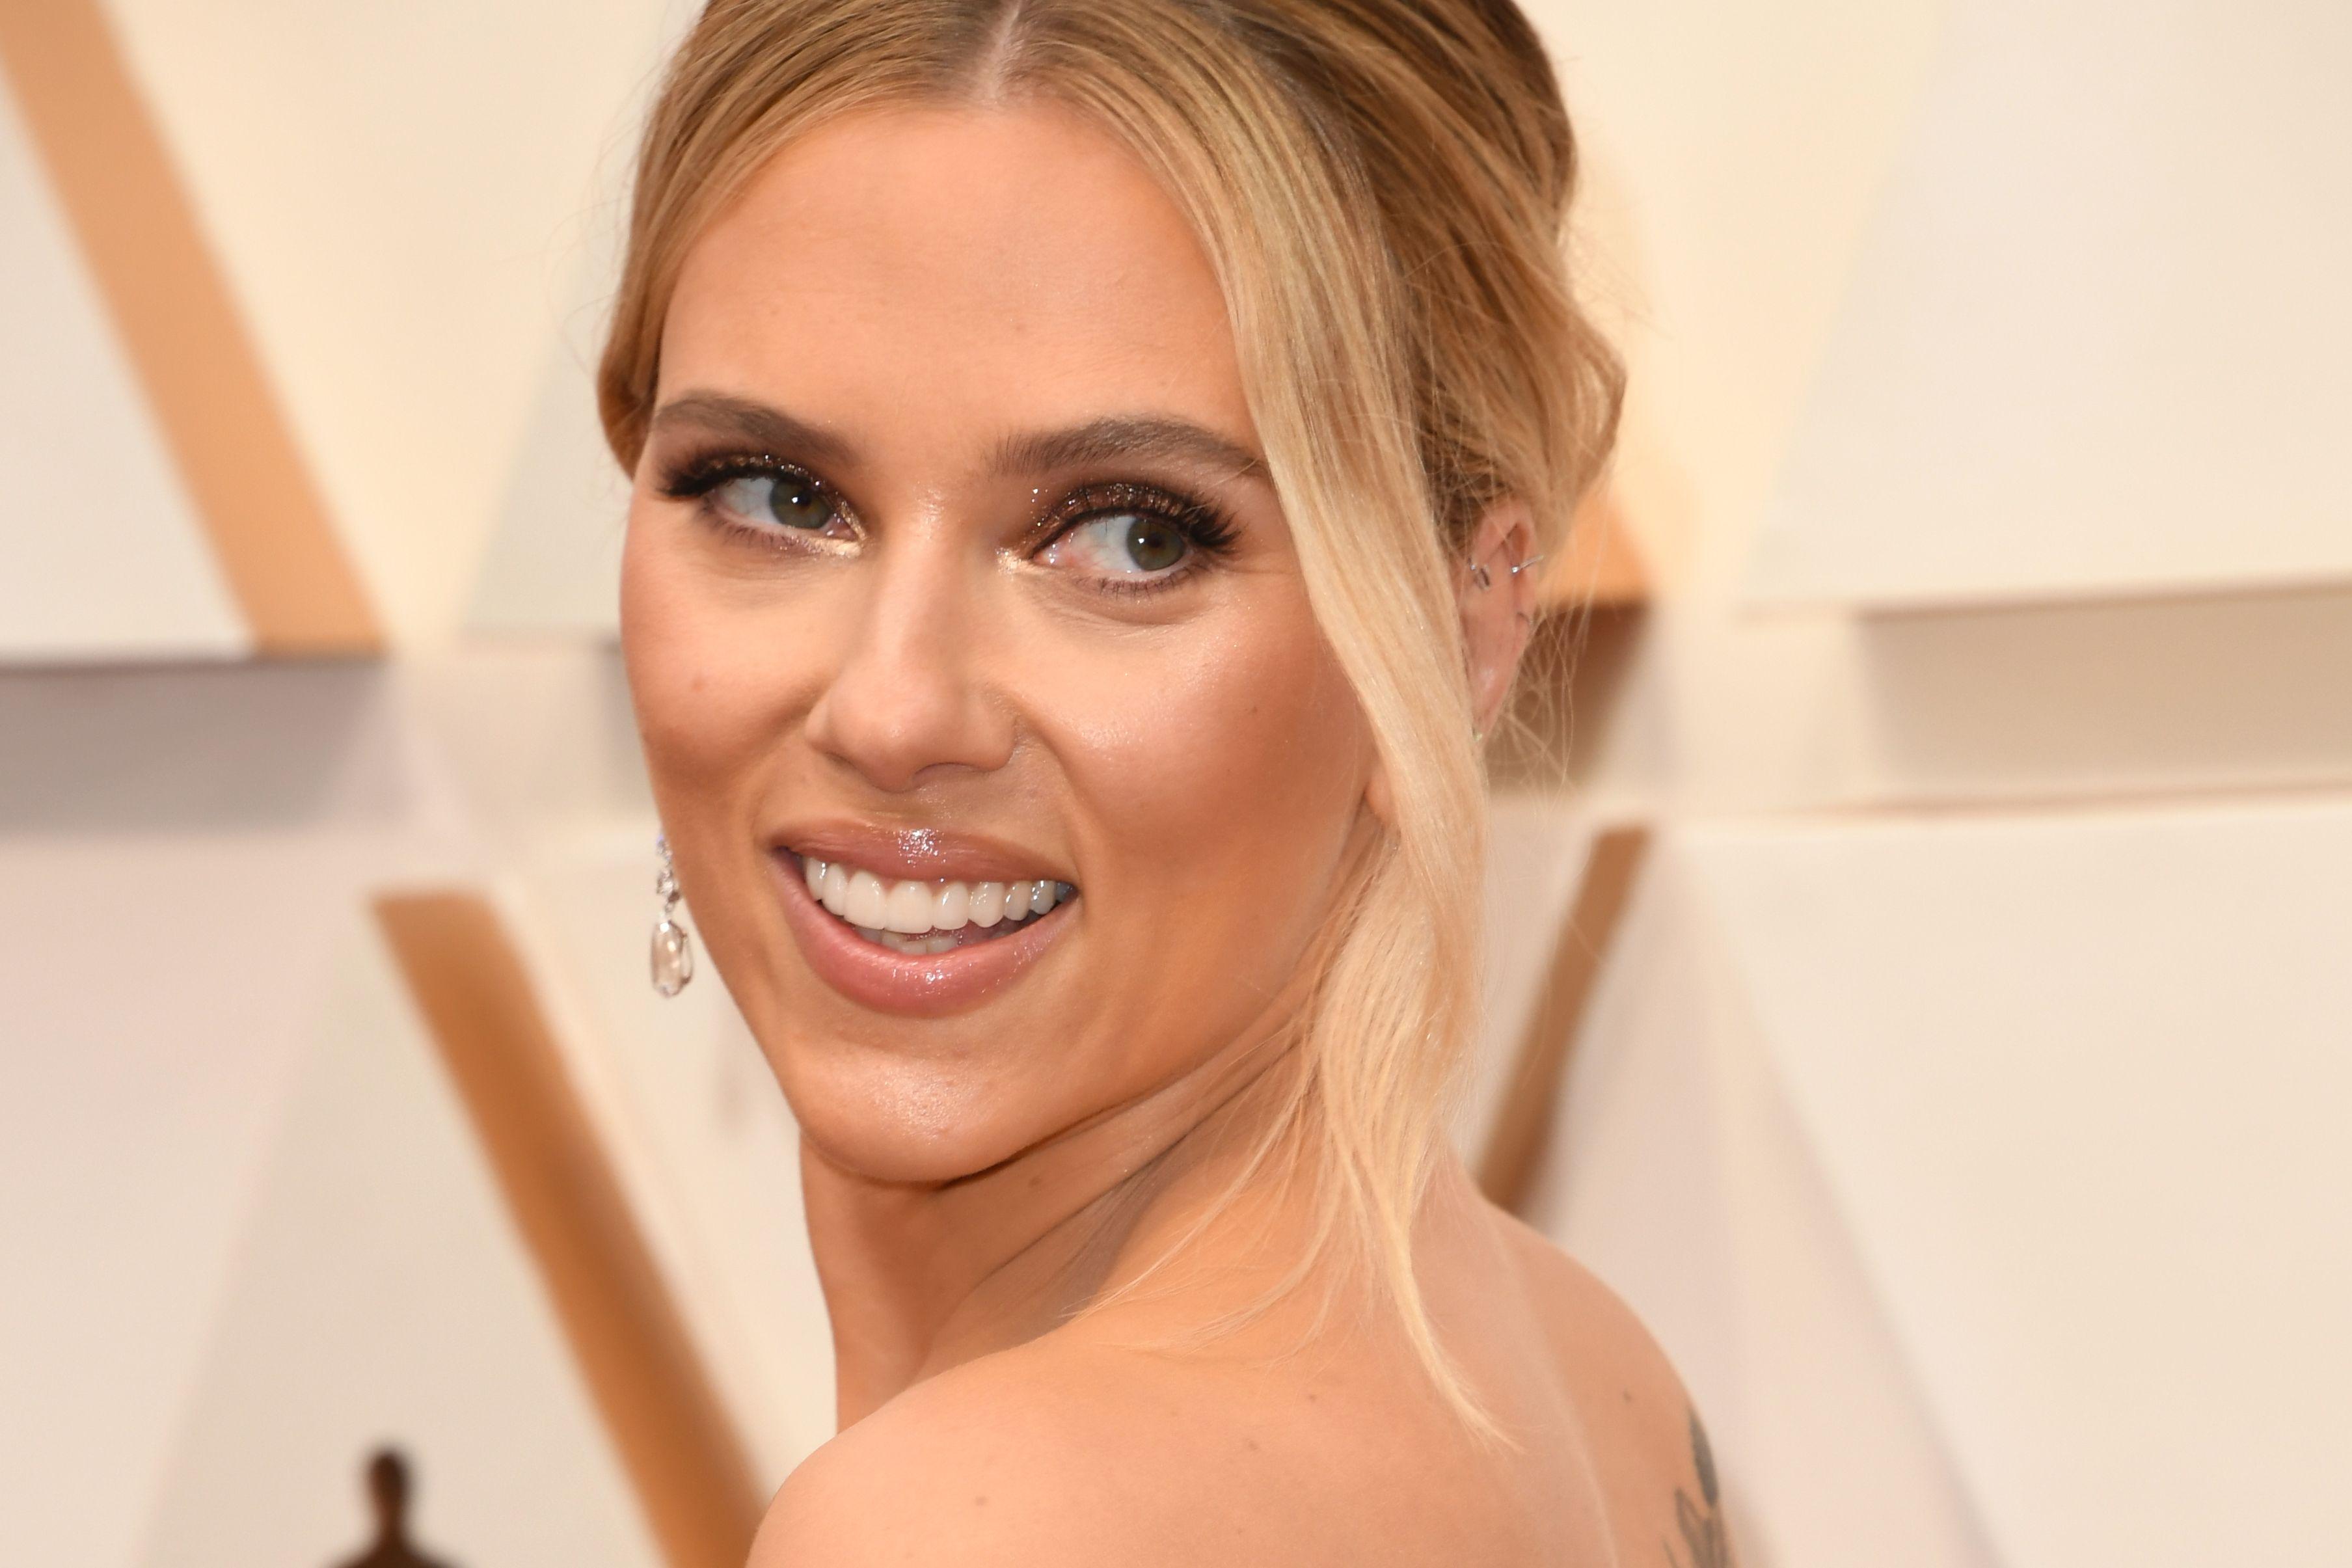 Scarlett Johansson Gave An Ex A Golden Gift With Teeth Literally